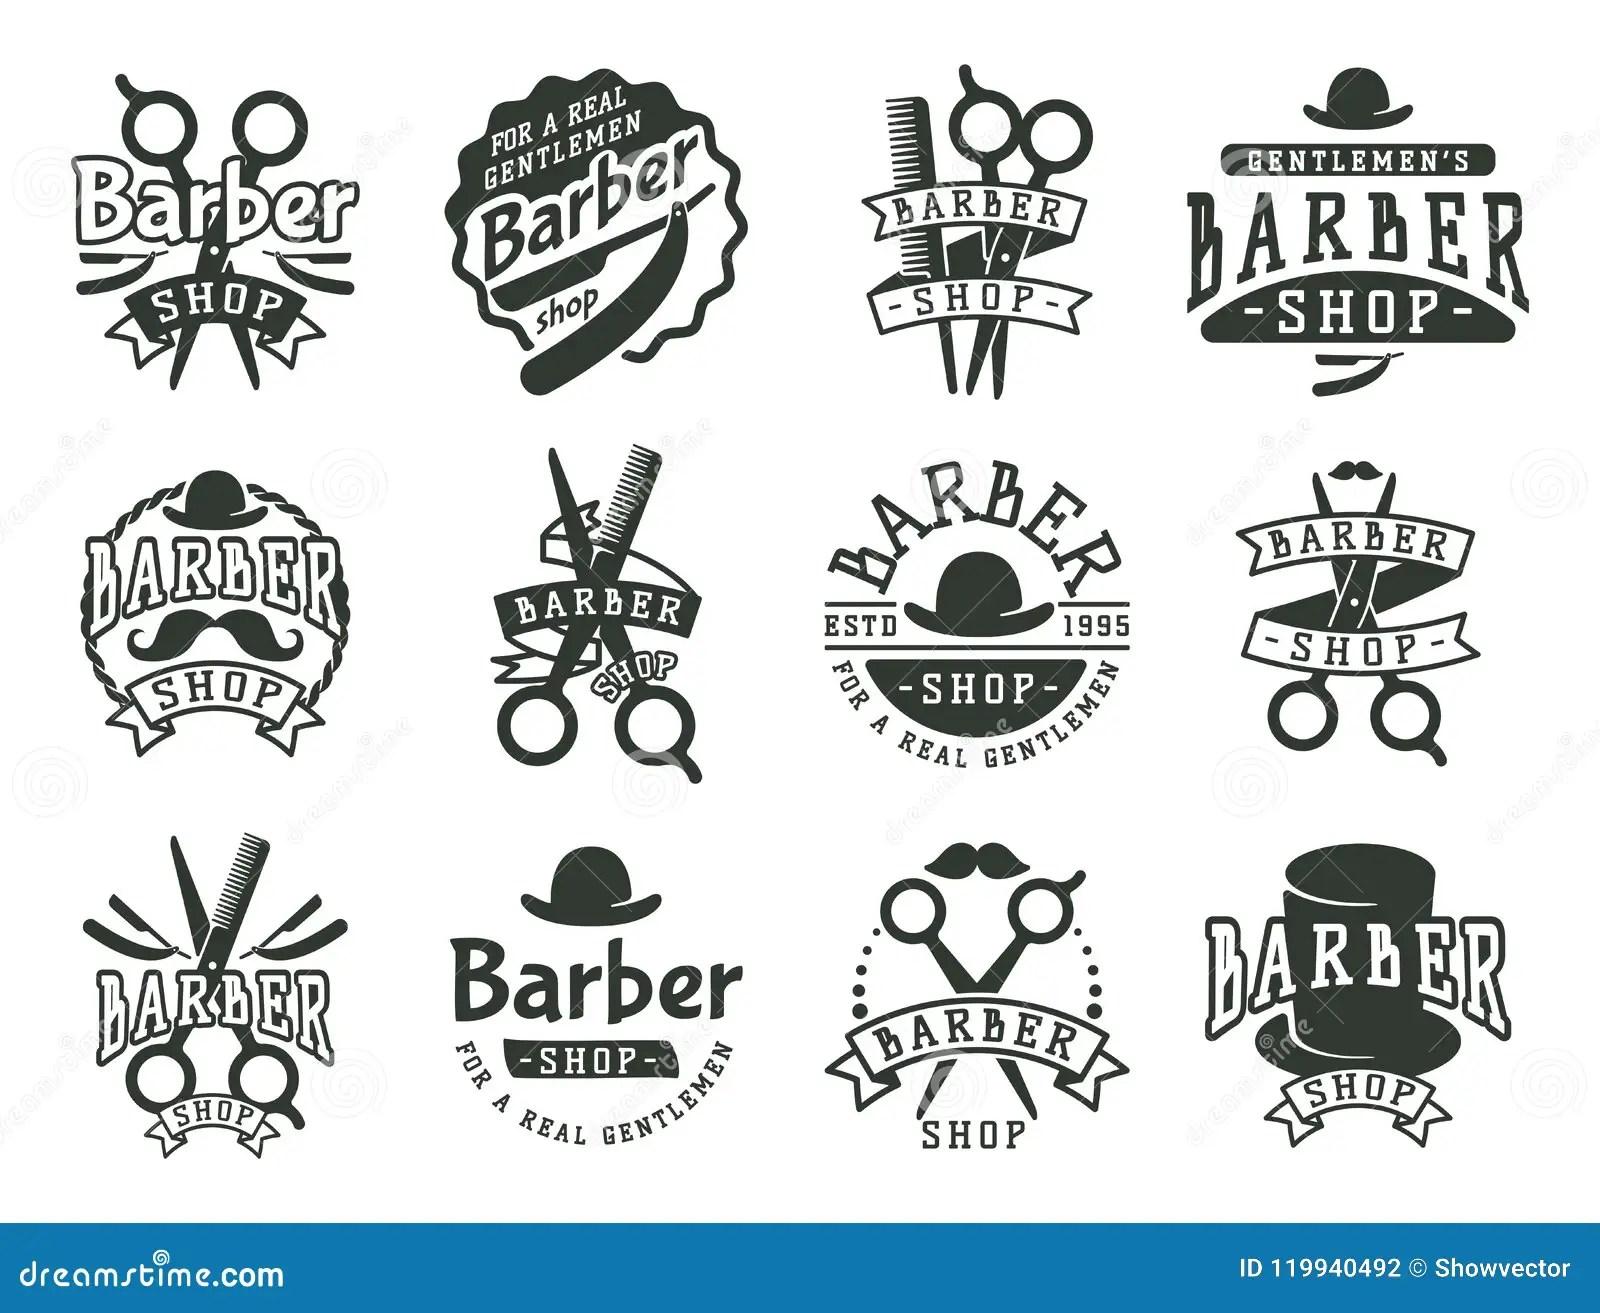 Vintage Barber Vector Logo Retro Style Haircutter